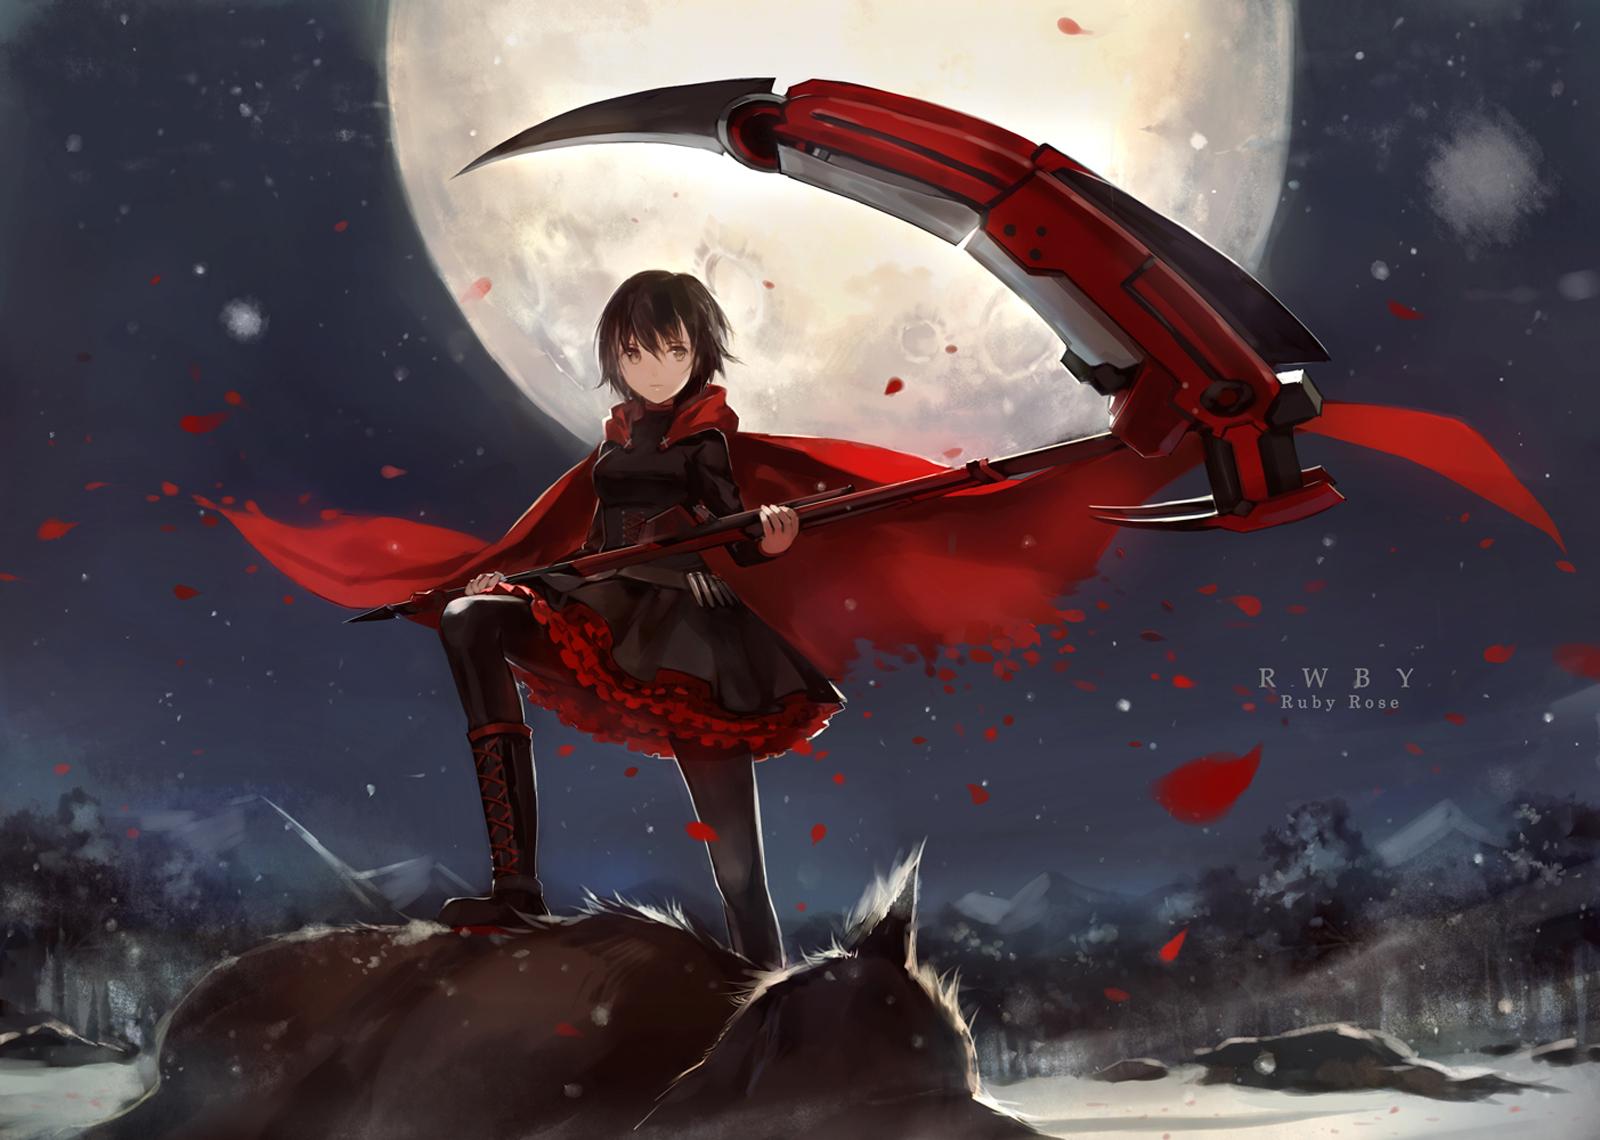 Ruby Rose RWBY Death Scythe Full Moon Wolf Petals Red Cape Girl Female Anime HD Wallpaper